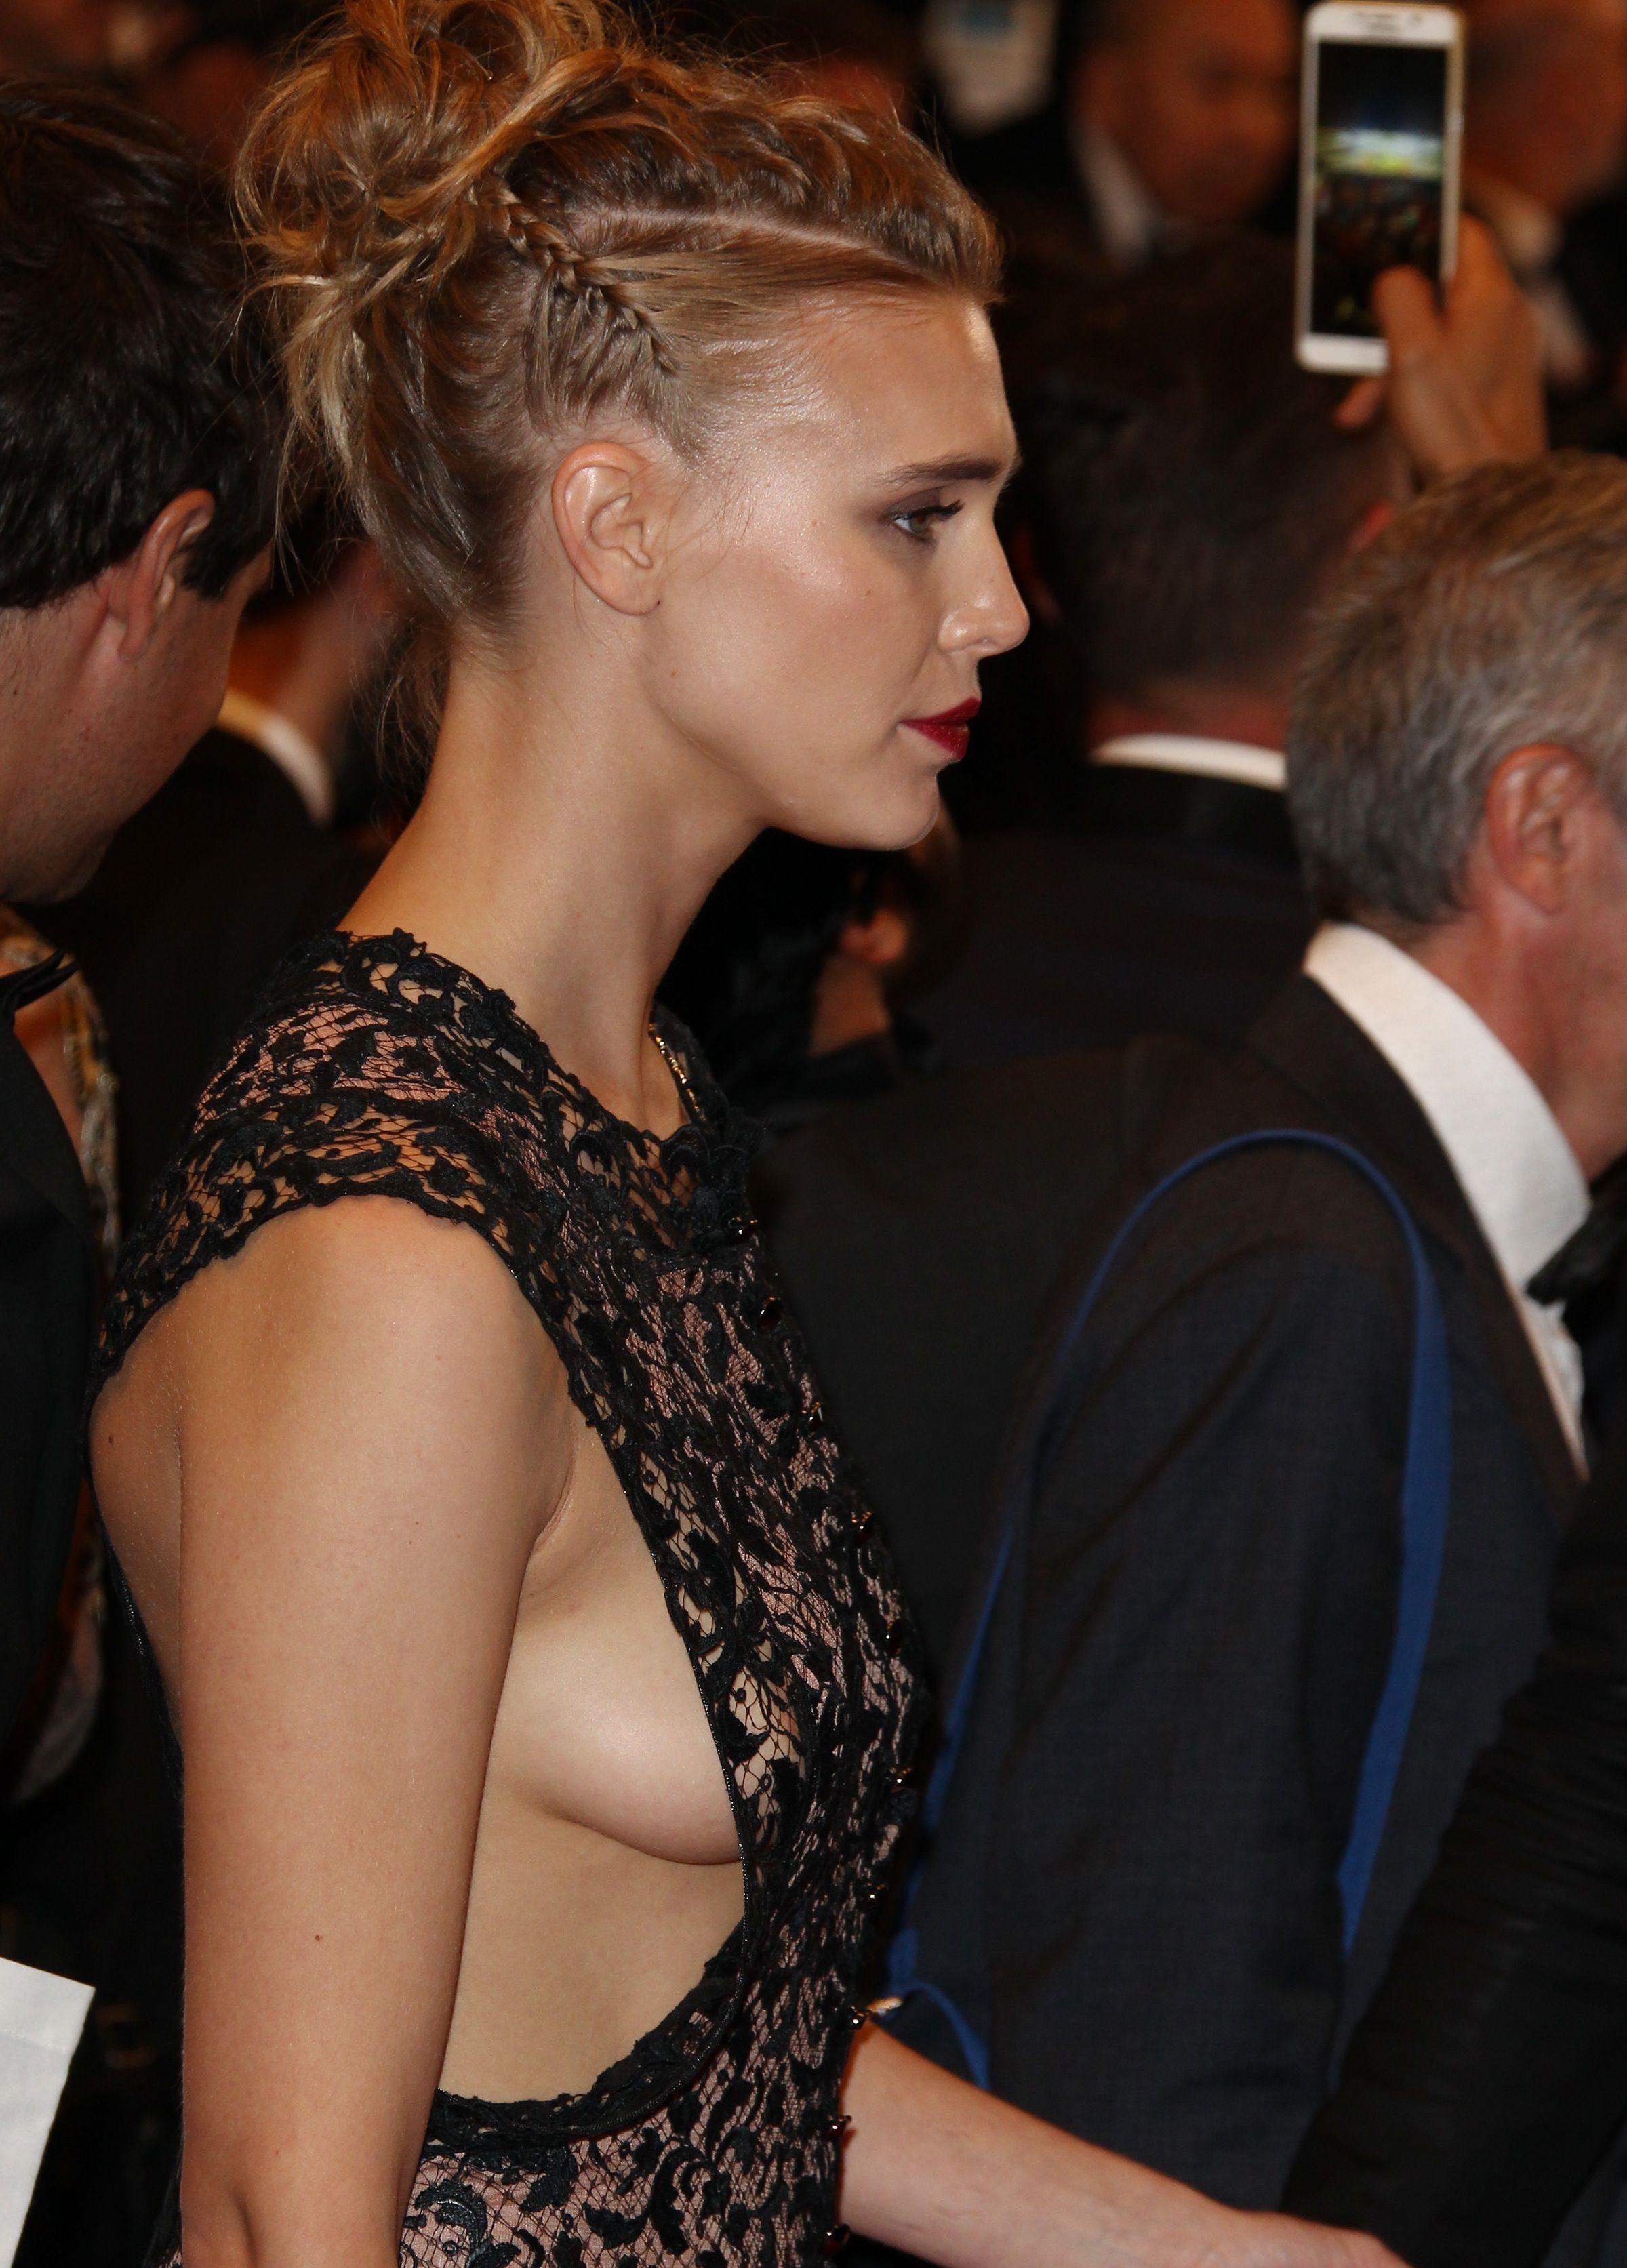 Darren ankenmen,Samantha hoopes nipple peek Hot tube Ria antoniou nude greek model will make u cum,Emma hernan nude